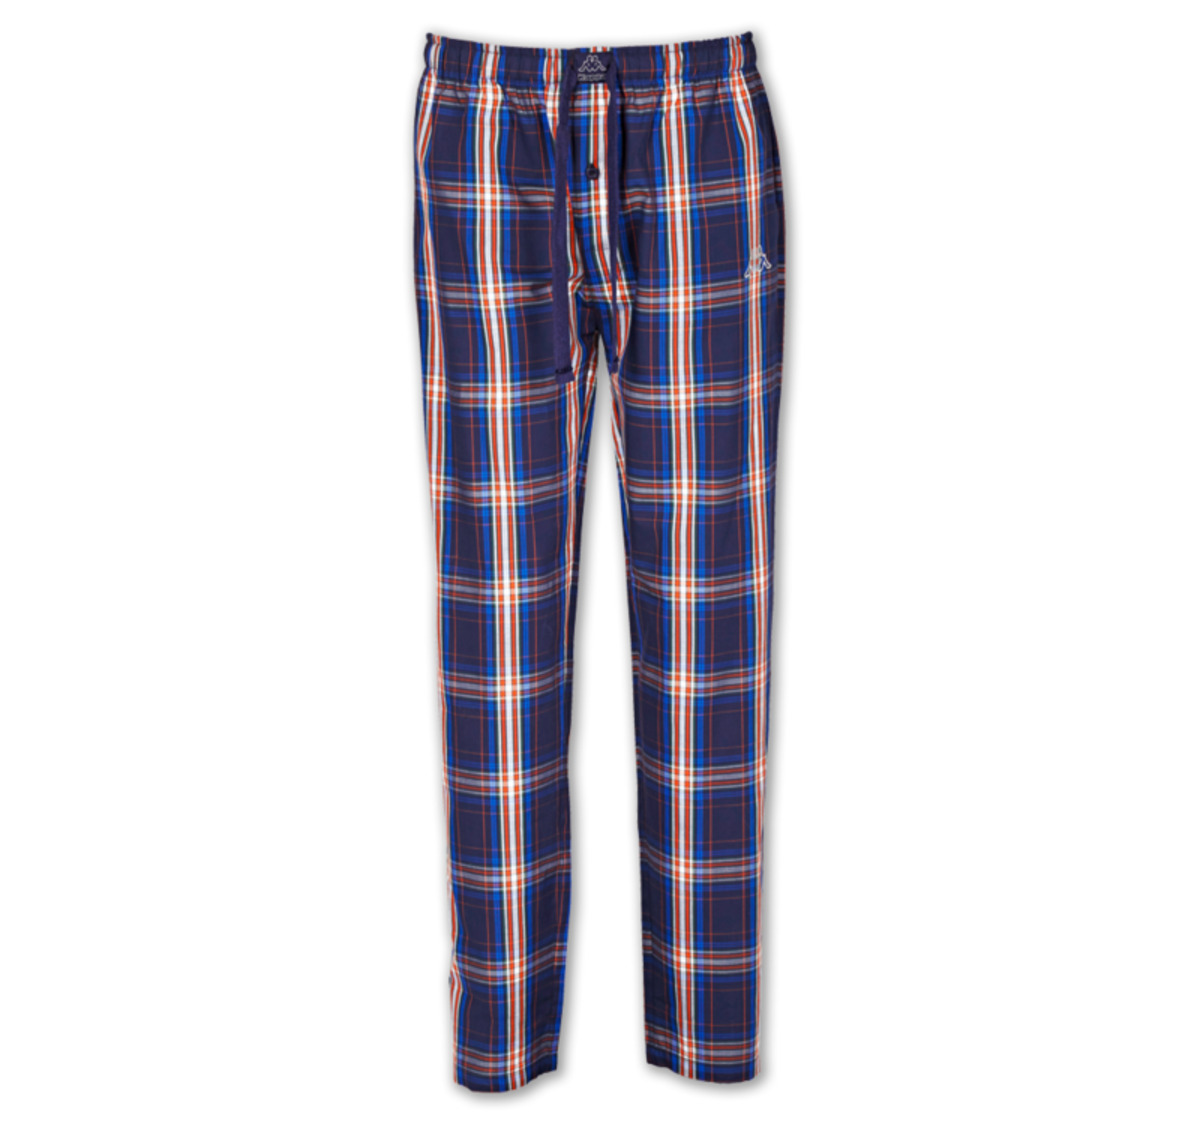 Bild 3 von KAPPA Herren-Pyjamahose